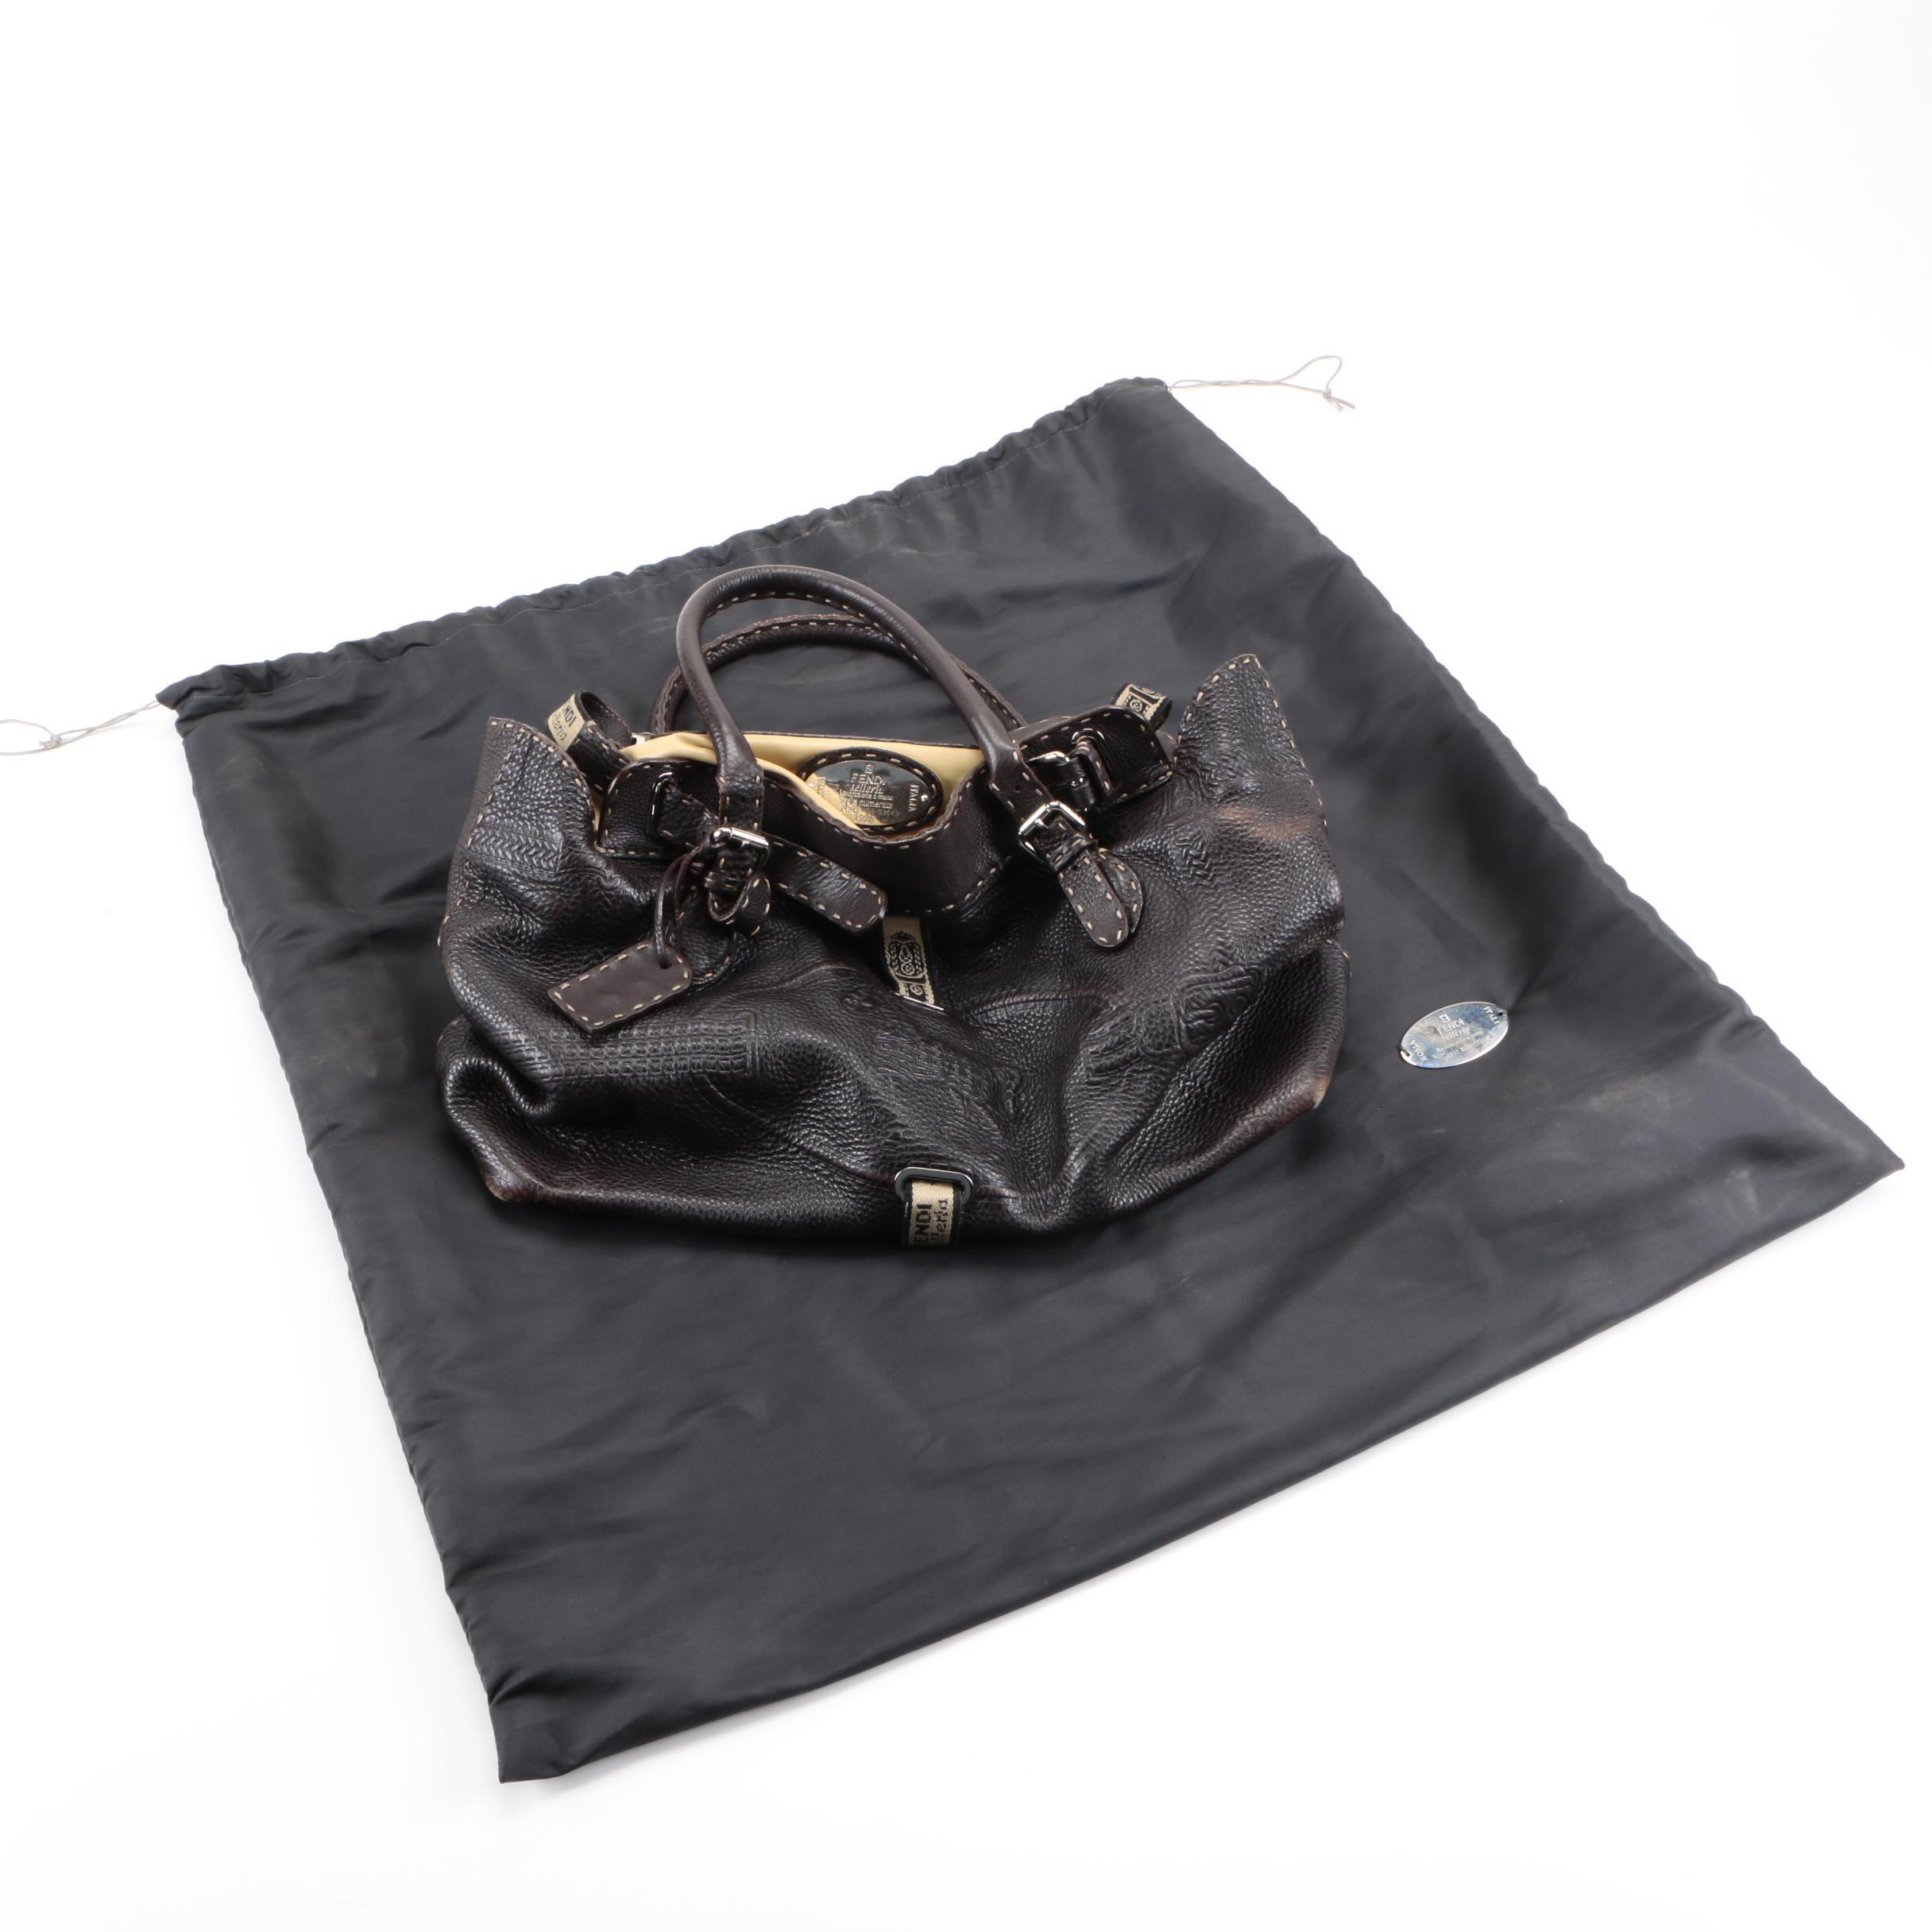 Fendi Selleria Leather Grand Borghese Handbag